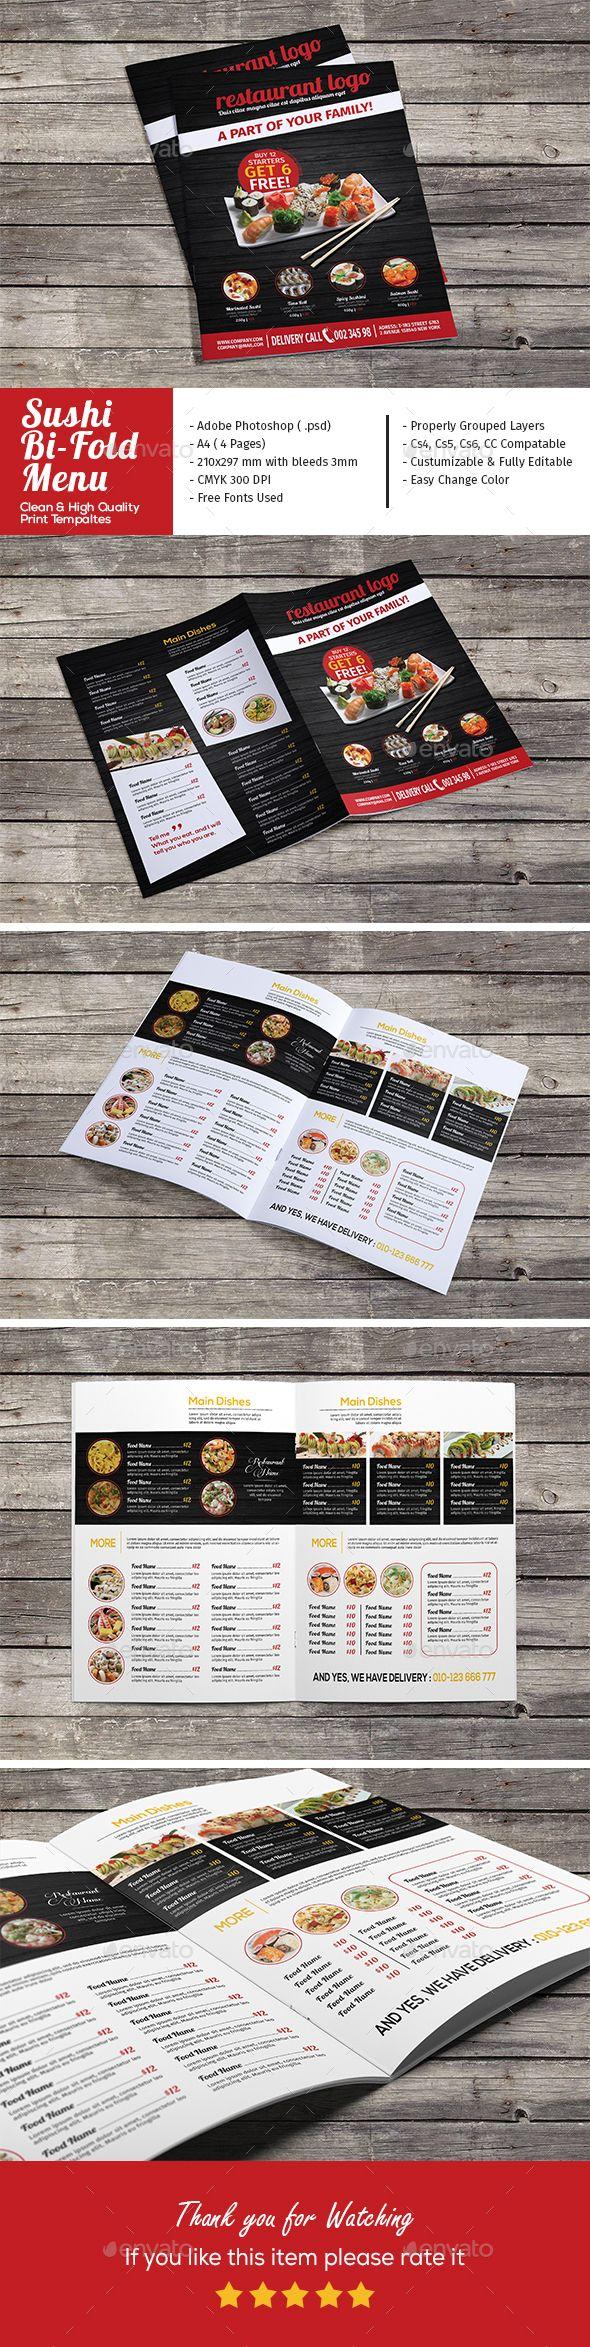 Sushi Restaurant Bi-Fold Menu - Food Menus Template PSD. Download here: http://graphicriver.net/item/sushi-restaurant-bifold-menu/16726272?s_rank=140&ref=yinkira